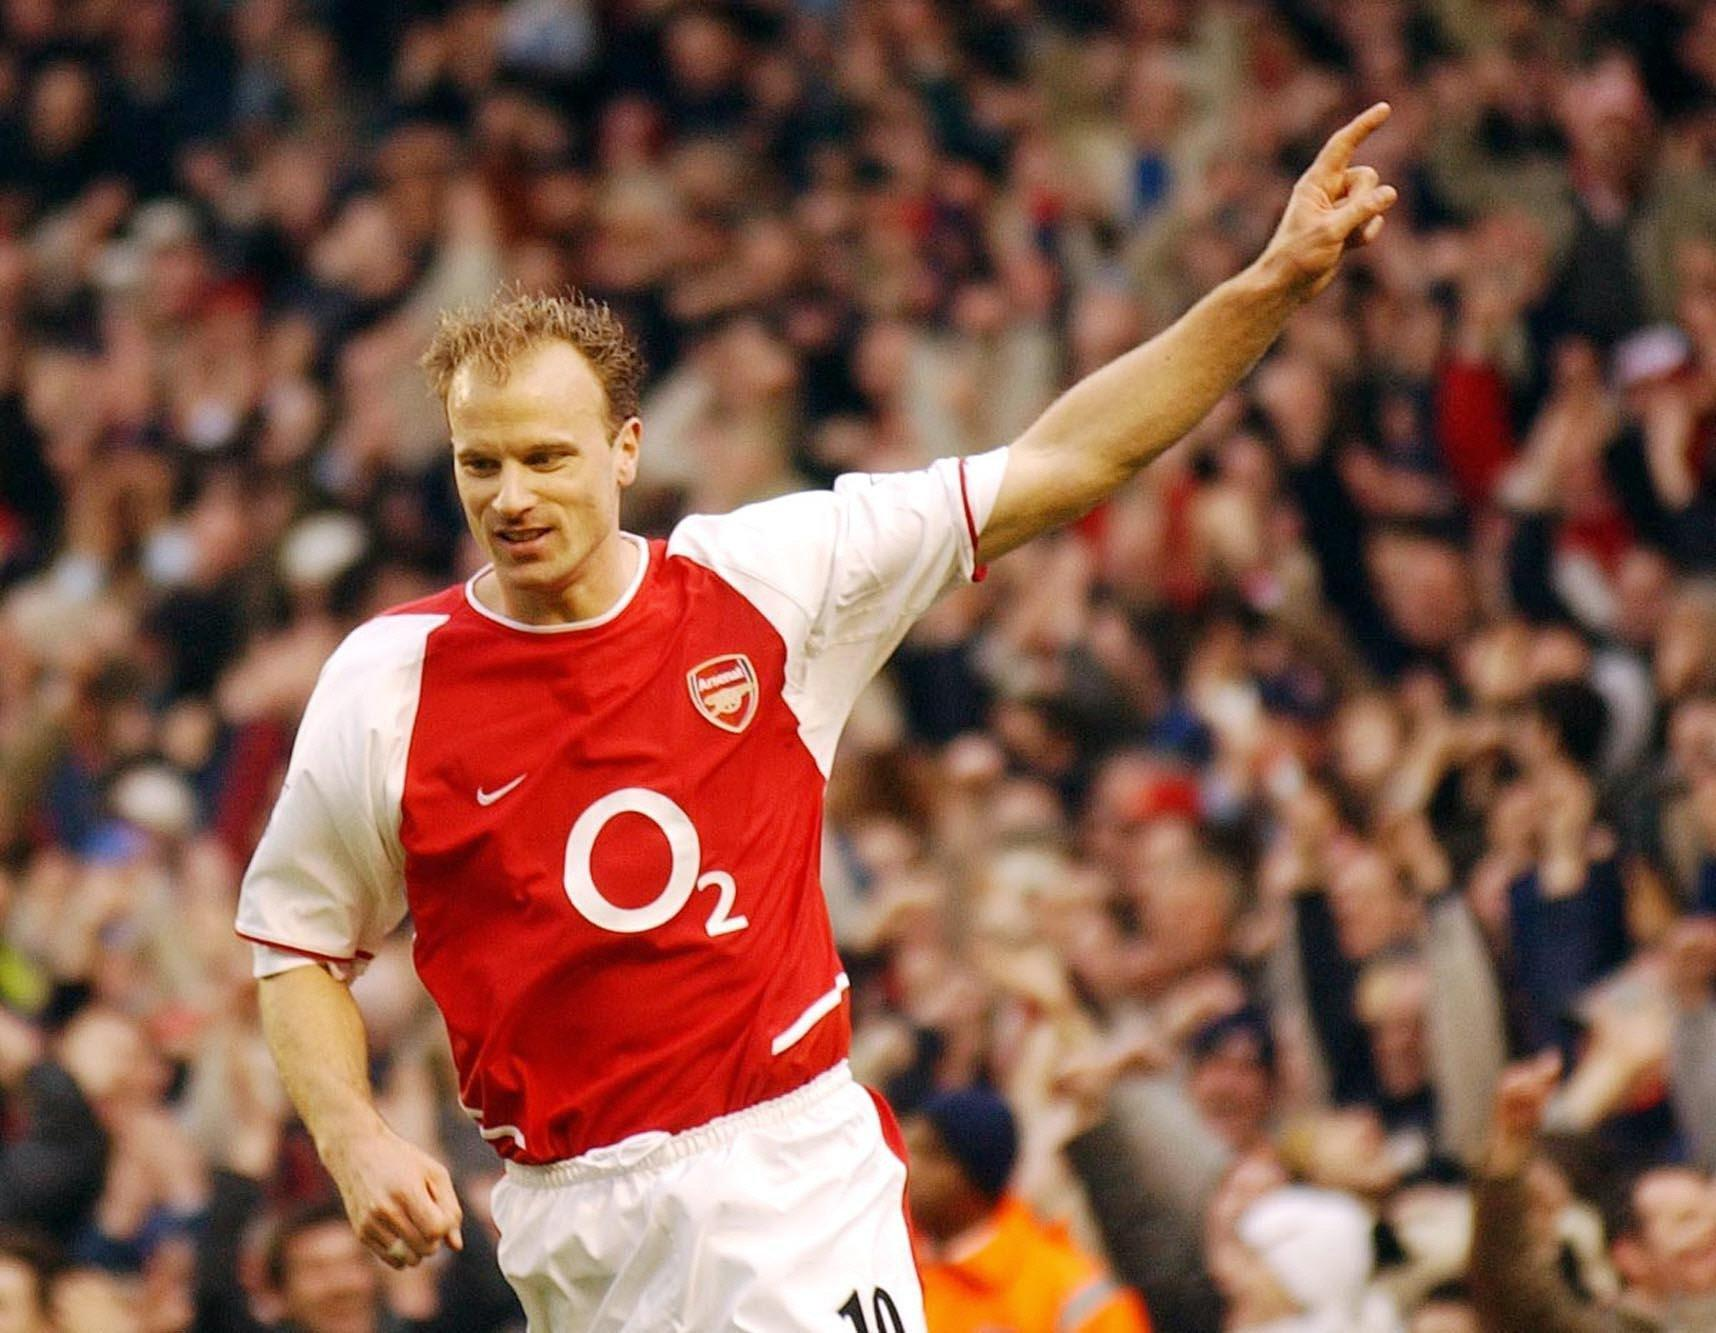 Class act Bergkamp averaged under eight league goals per season during his Arsenal career